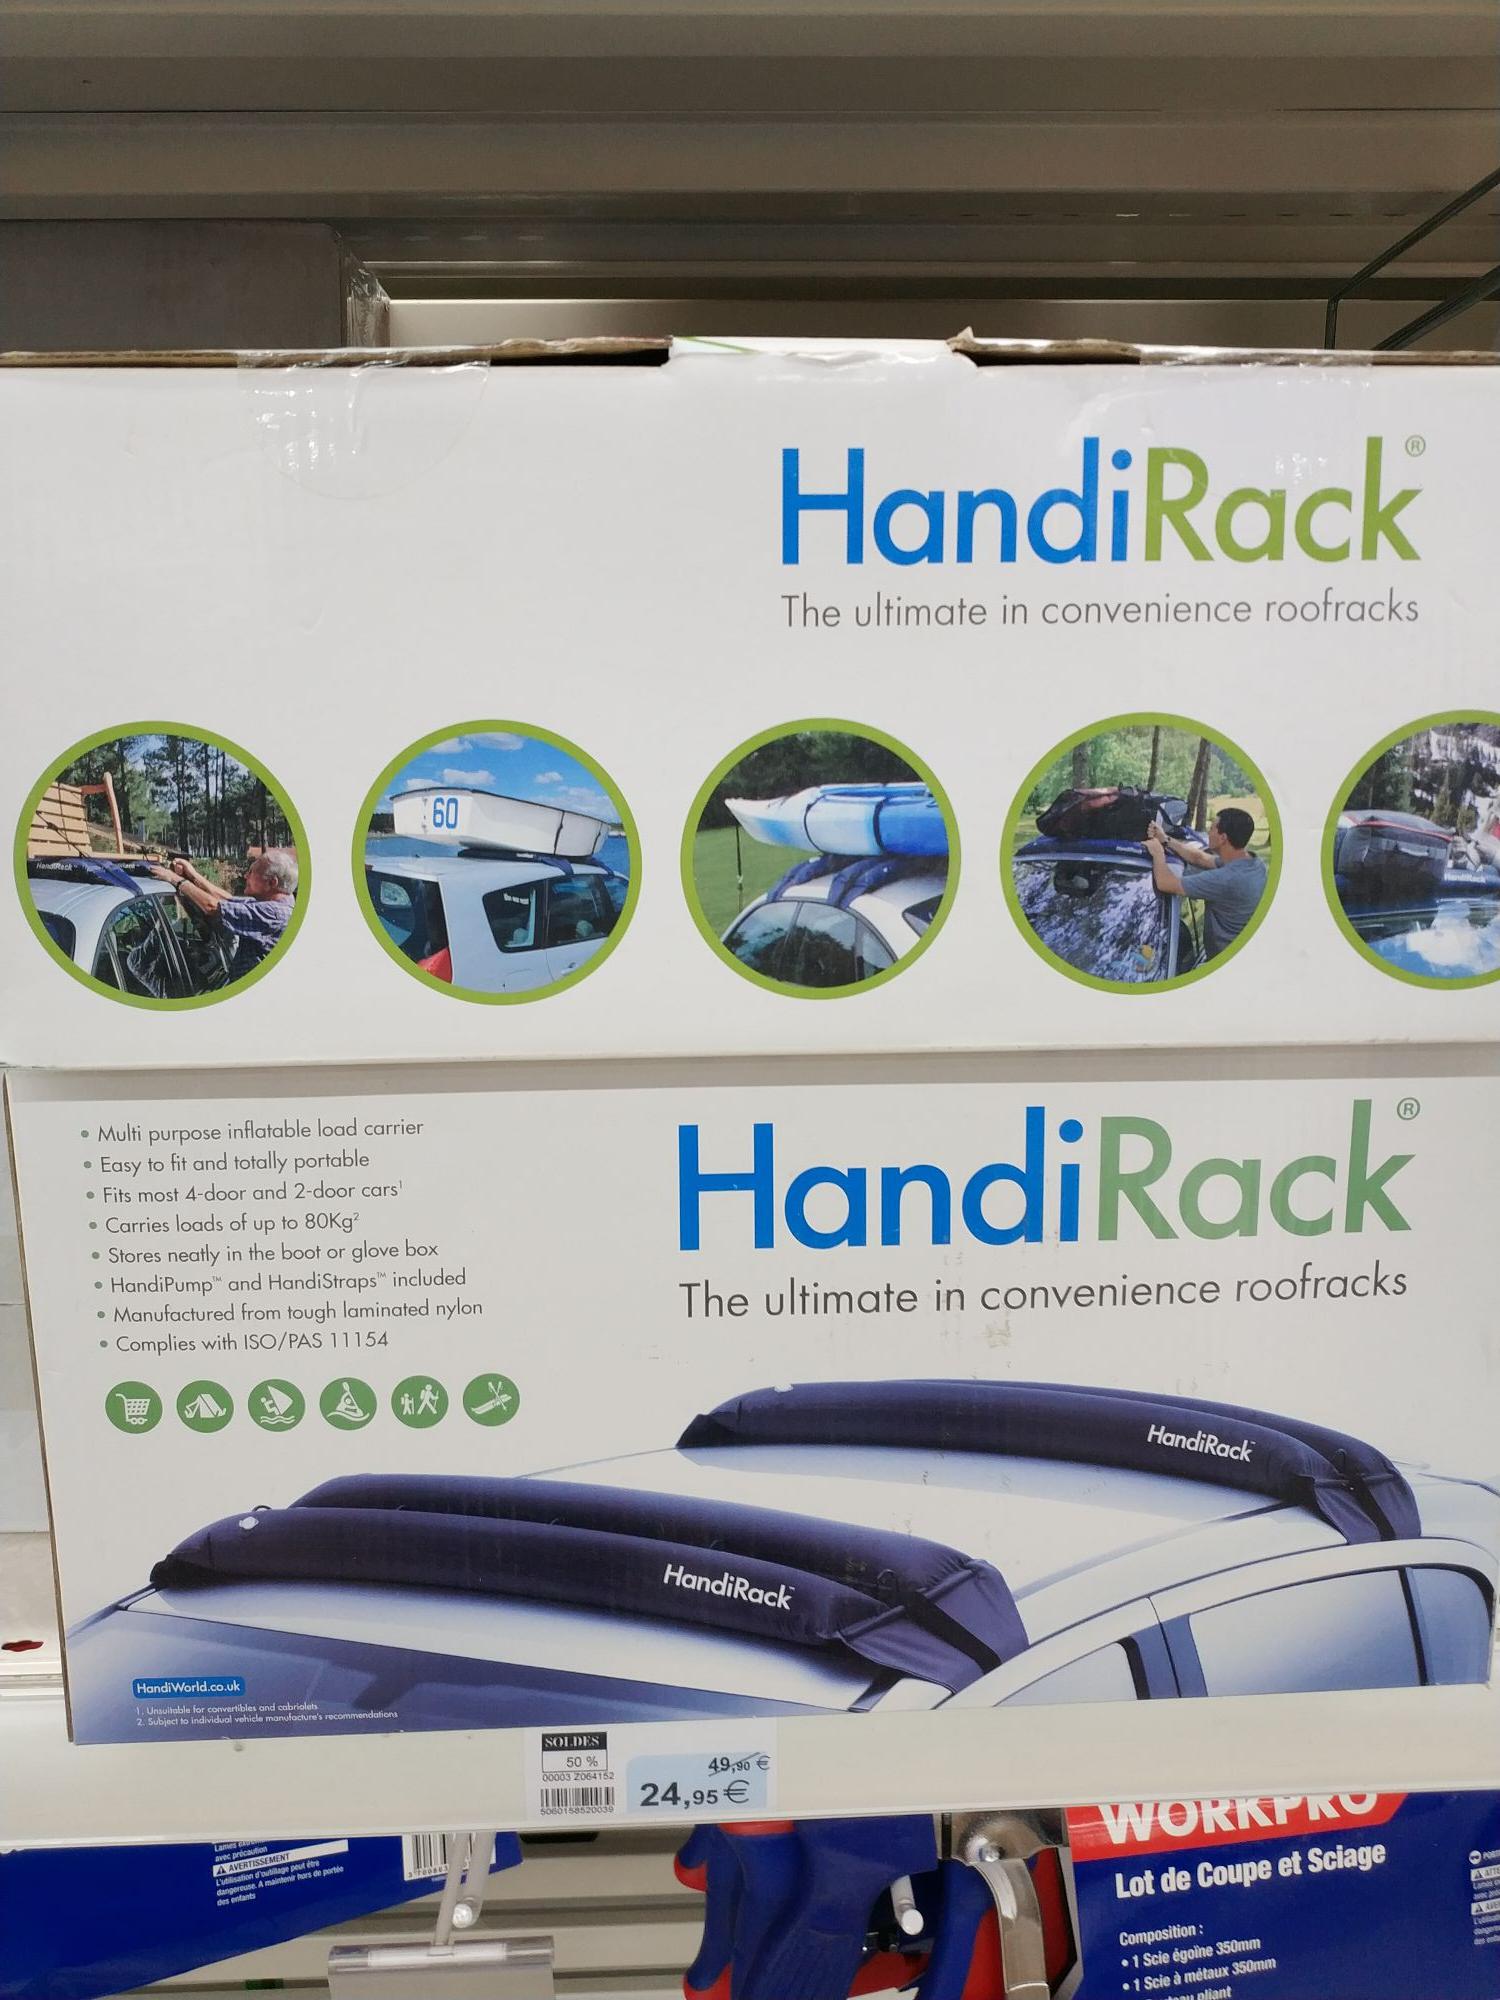 Barre de toit gonflable handirack handiworld - Hyper U Vitré (35)